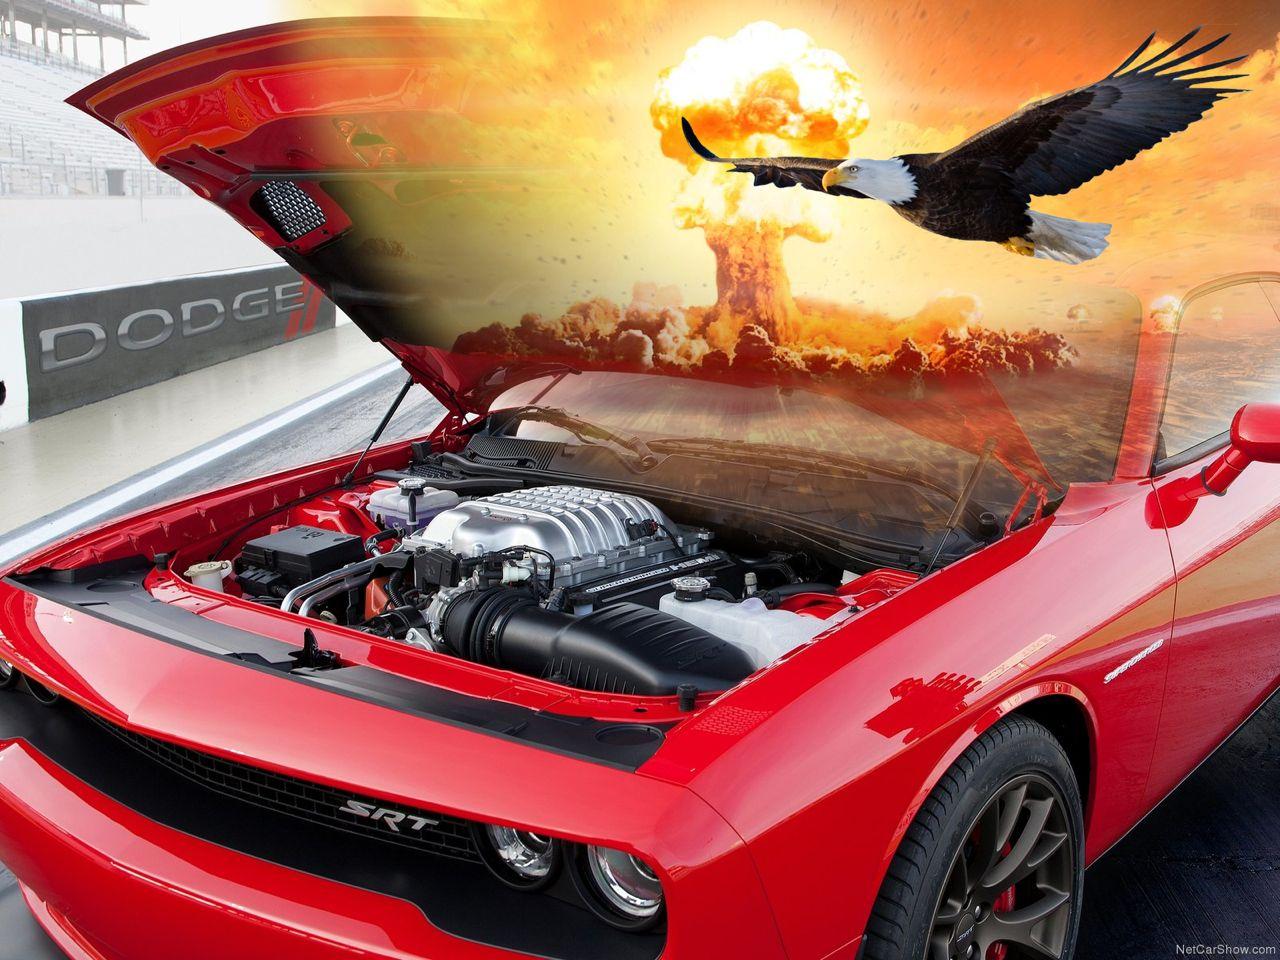 Dodge Challenger SRT Hellcat Engine